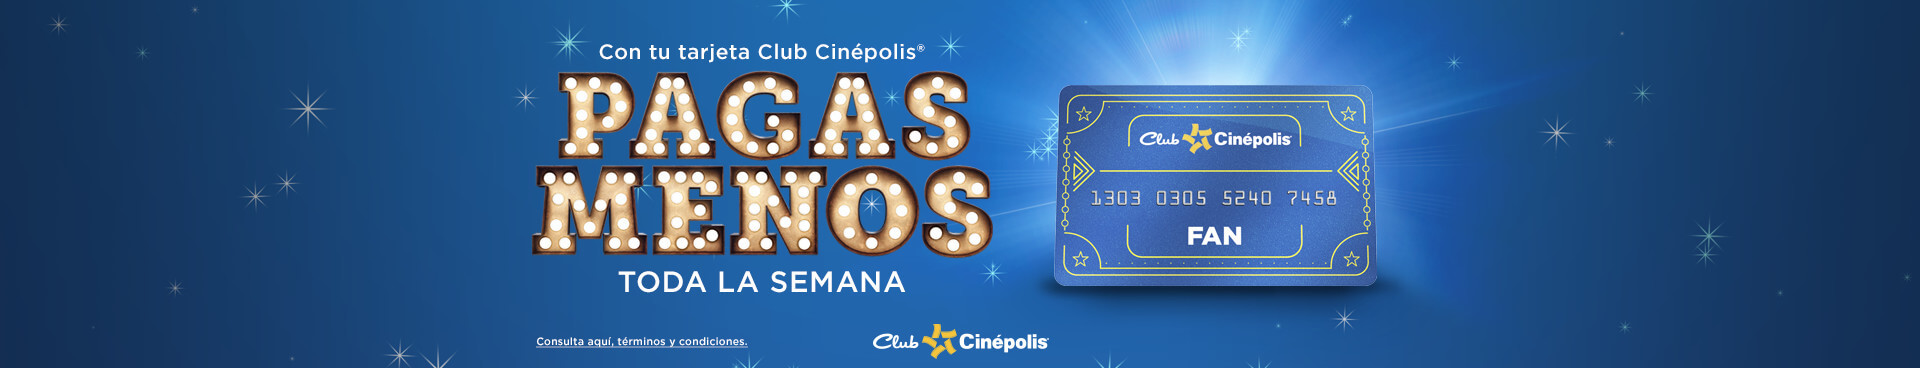 Paga menos Club Cinépolis